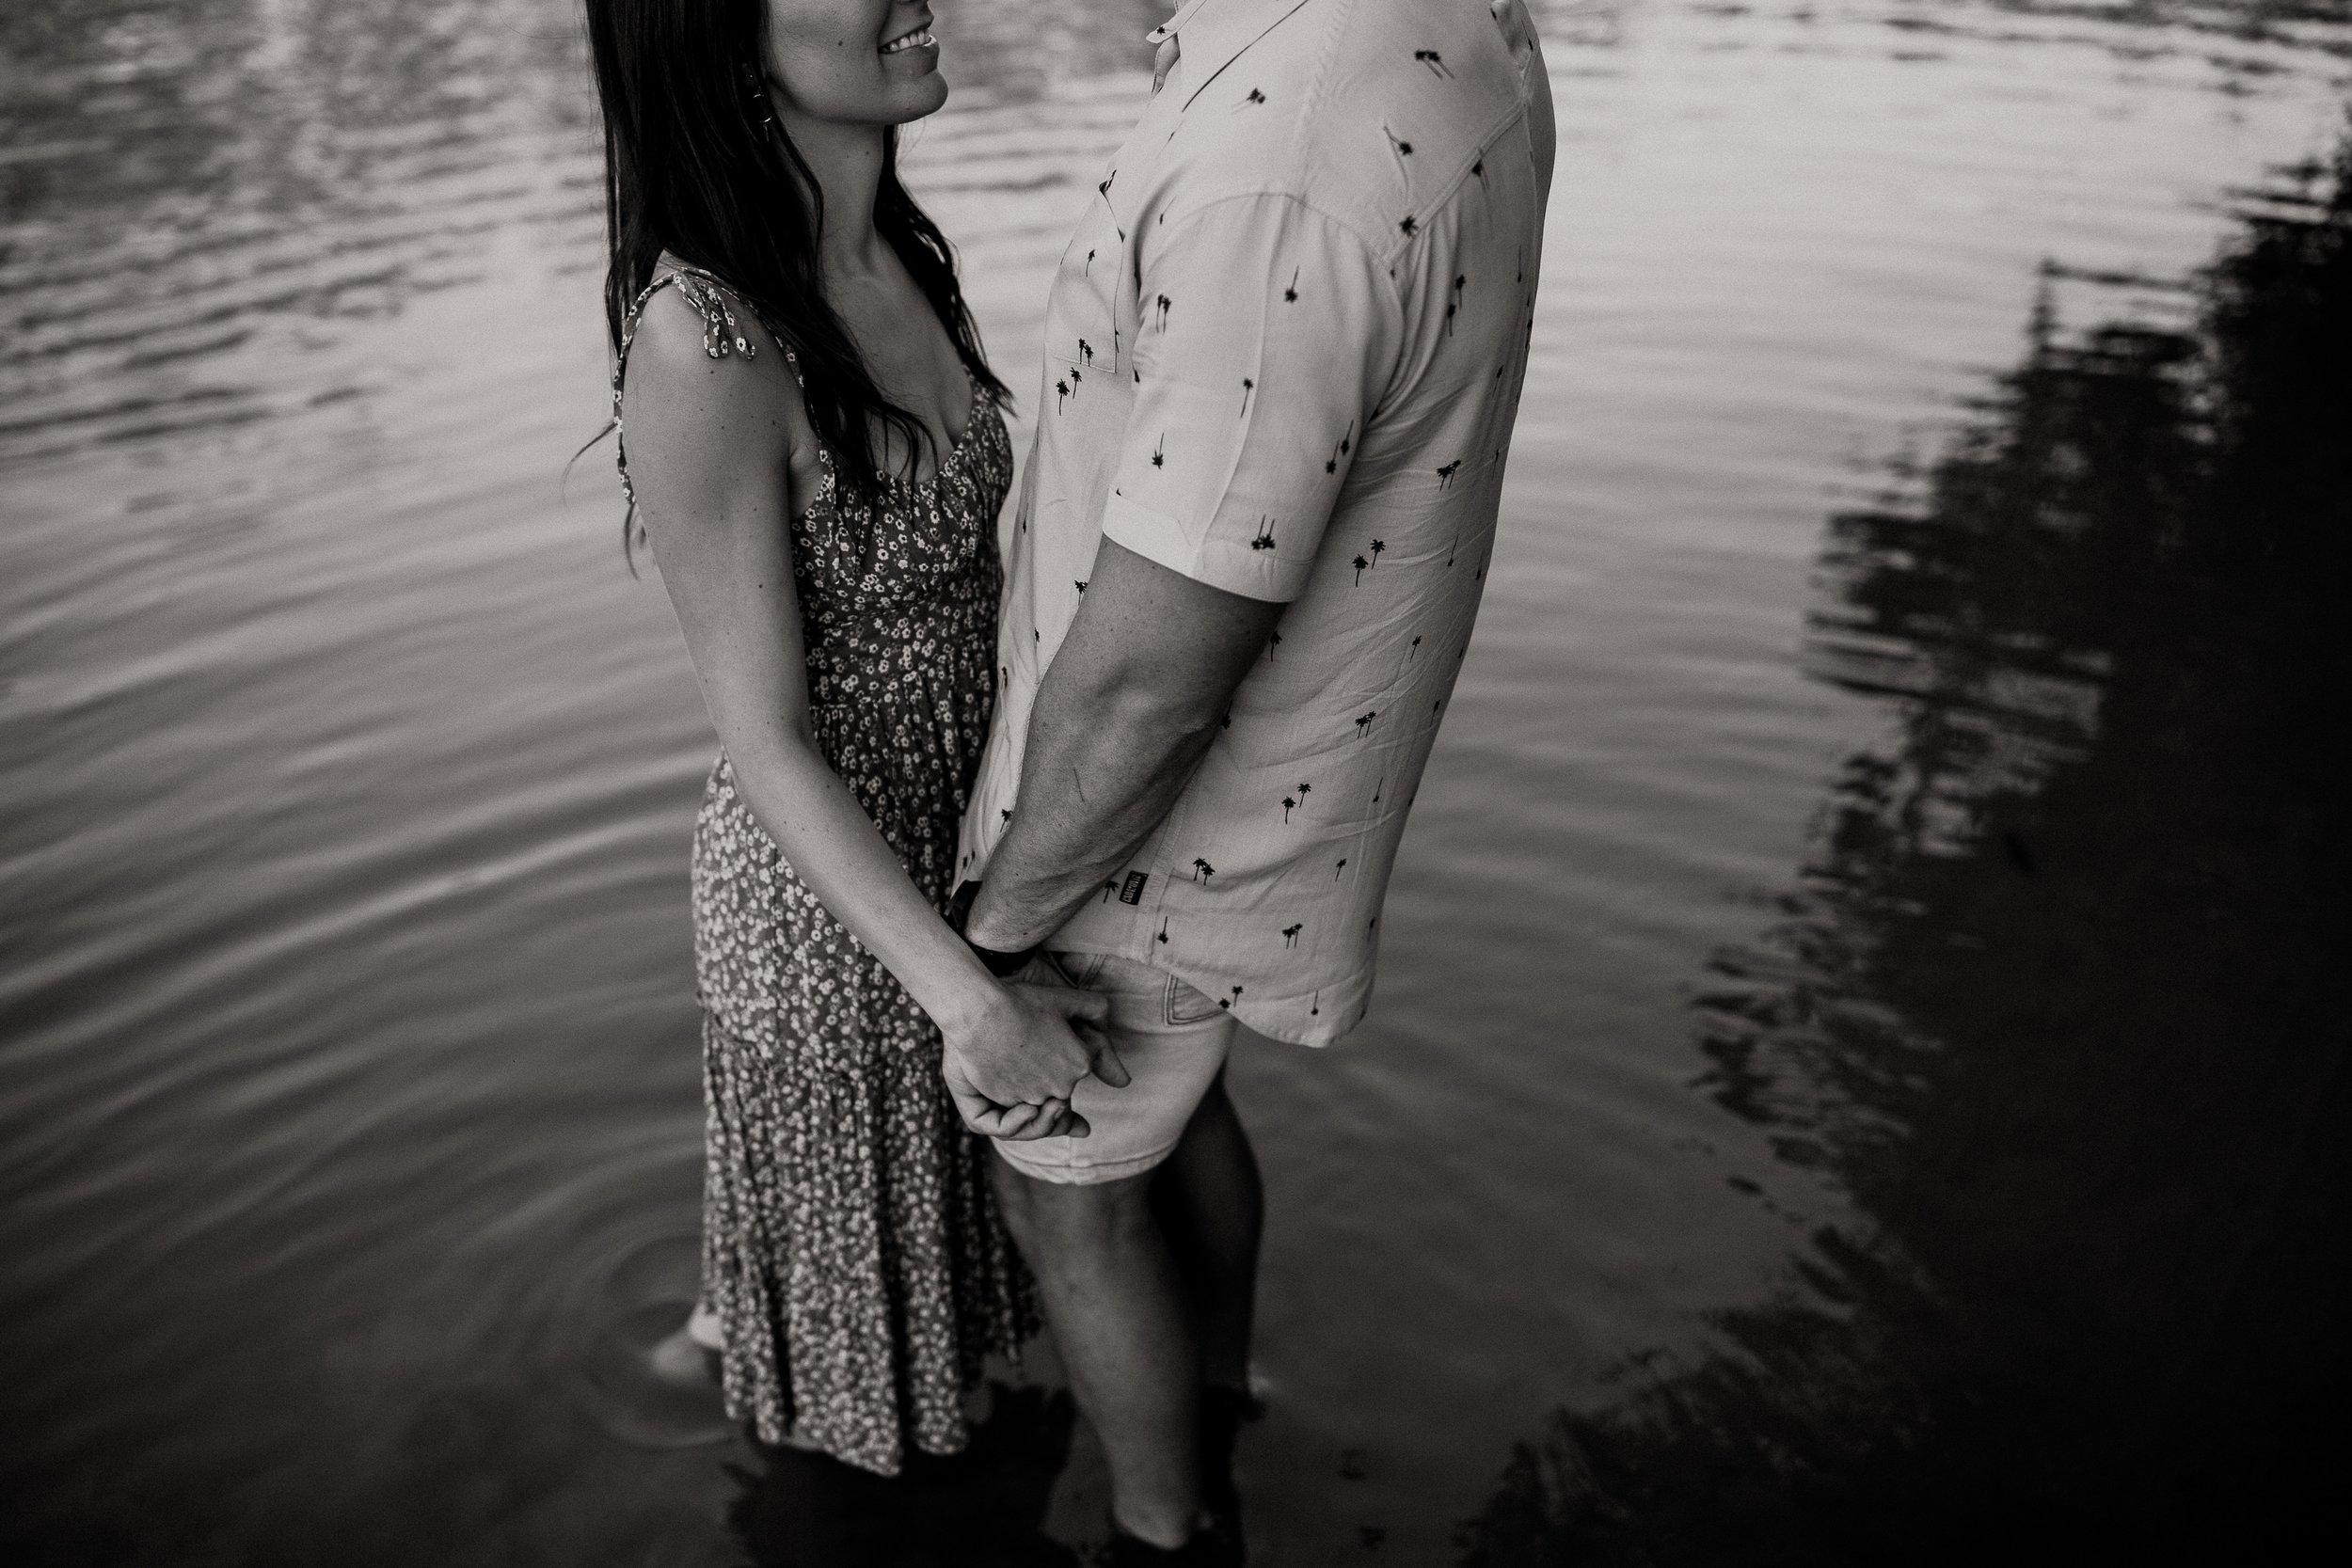 mickalathomas_puremacphotography_weddingphotographer_couplephotographer_Sheppartonphotographer_2675.jpg